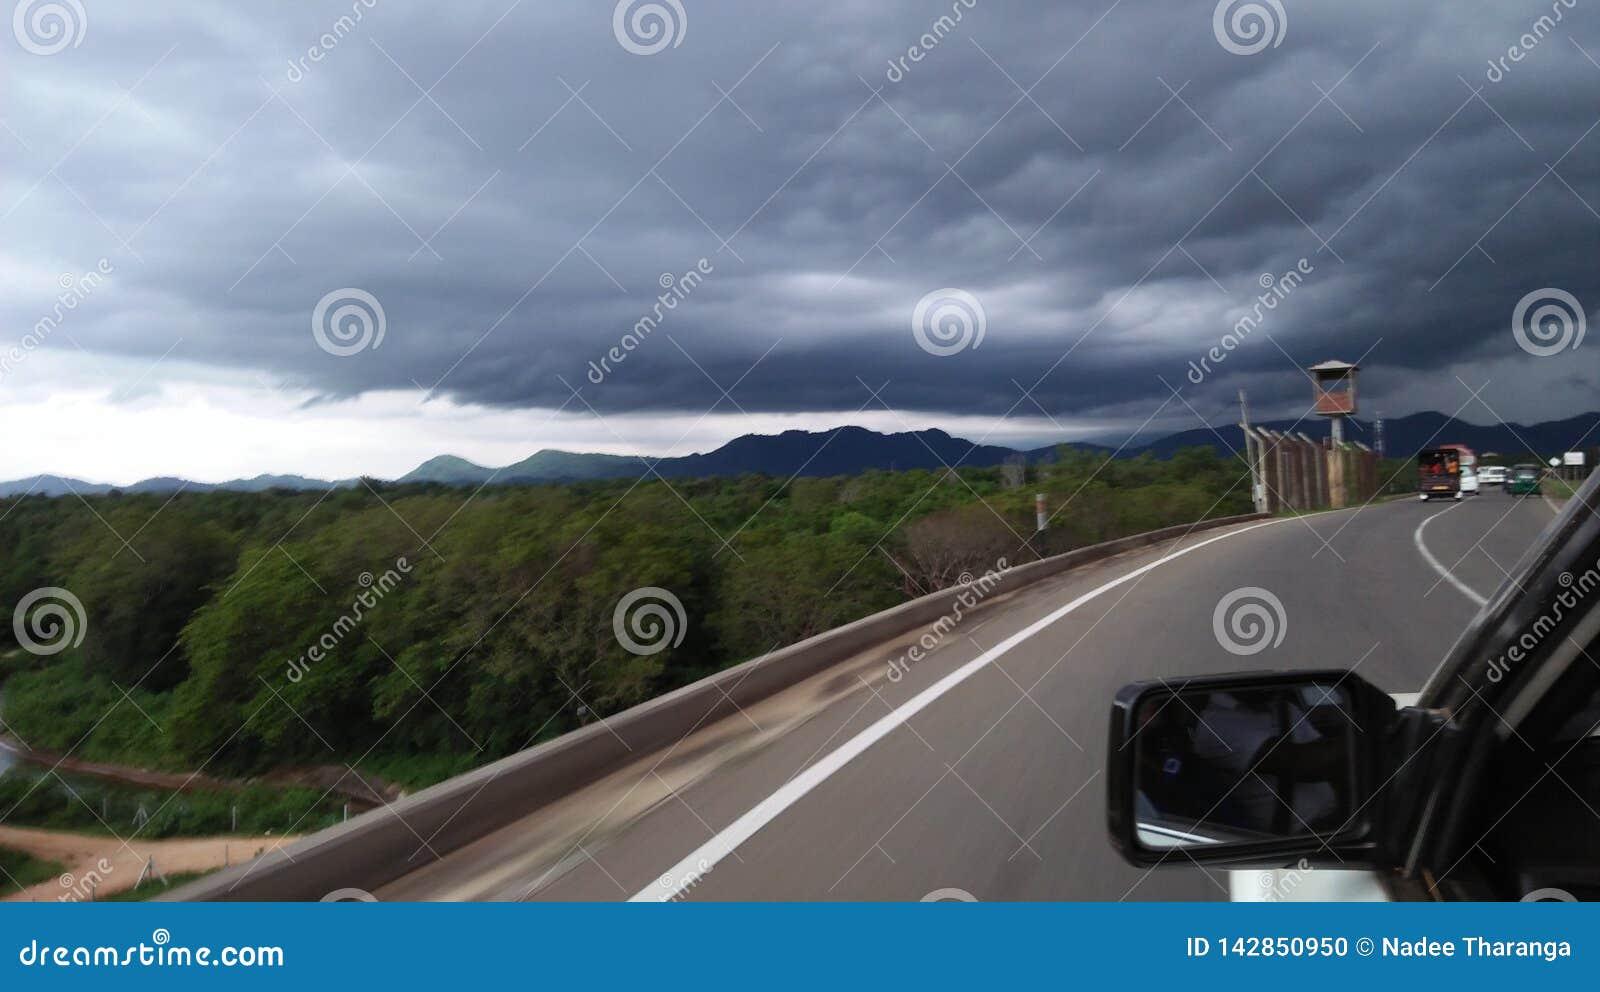 Sri lanka highway road in the goal is beautiful